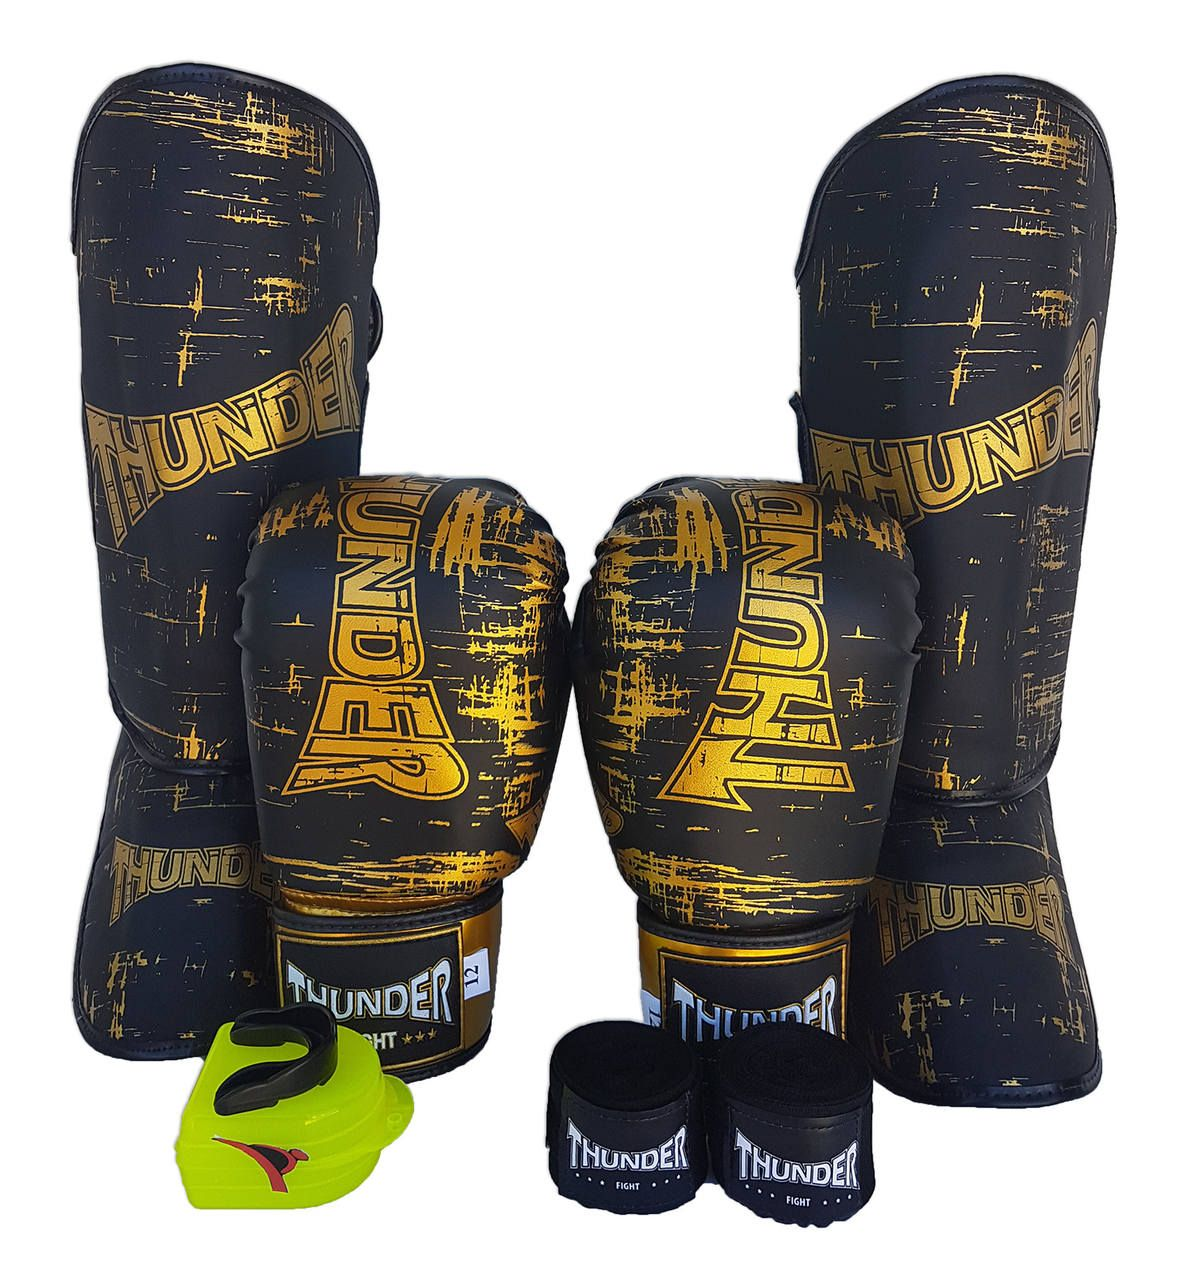 Super Kit de Muay Thai / Kickboxing 14oz - Caneleira M - Preto - Thunder Fight  - PRALUTA SHOP